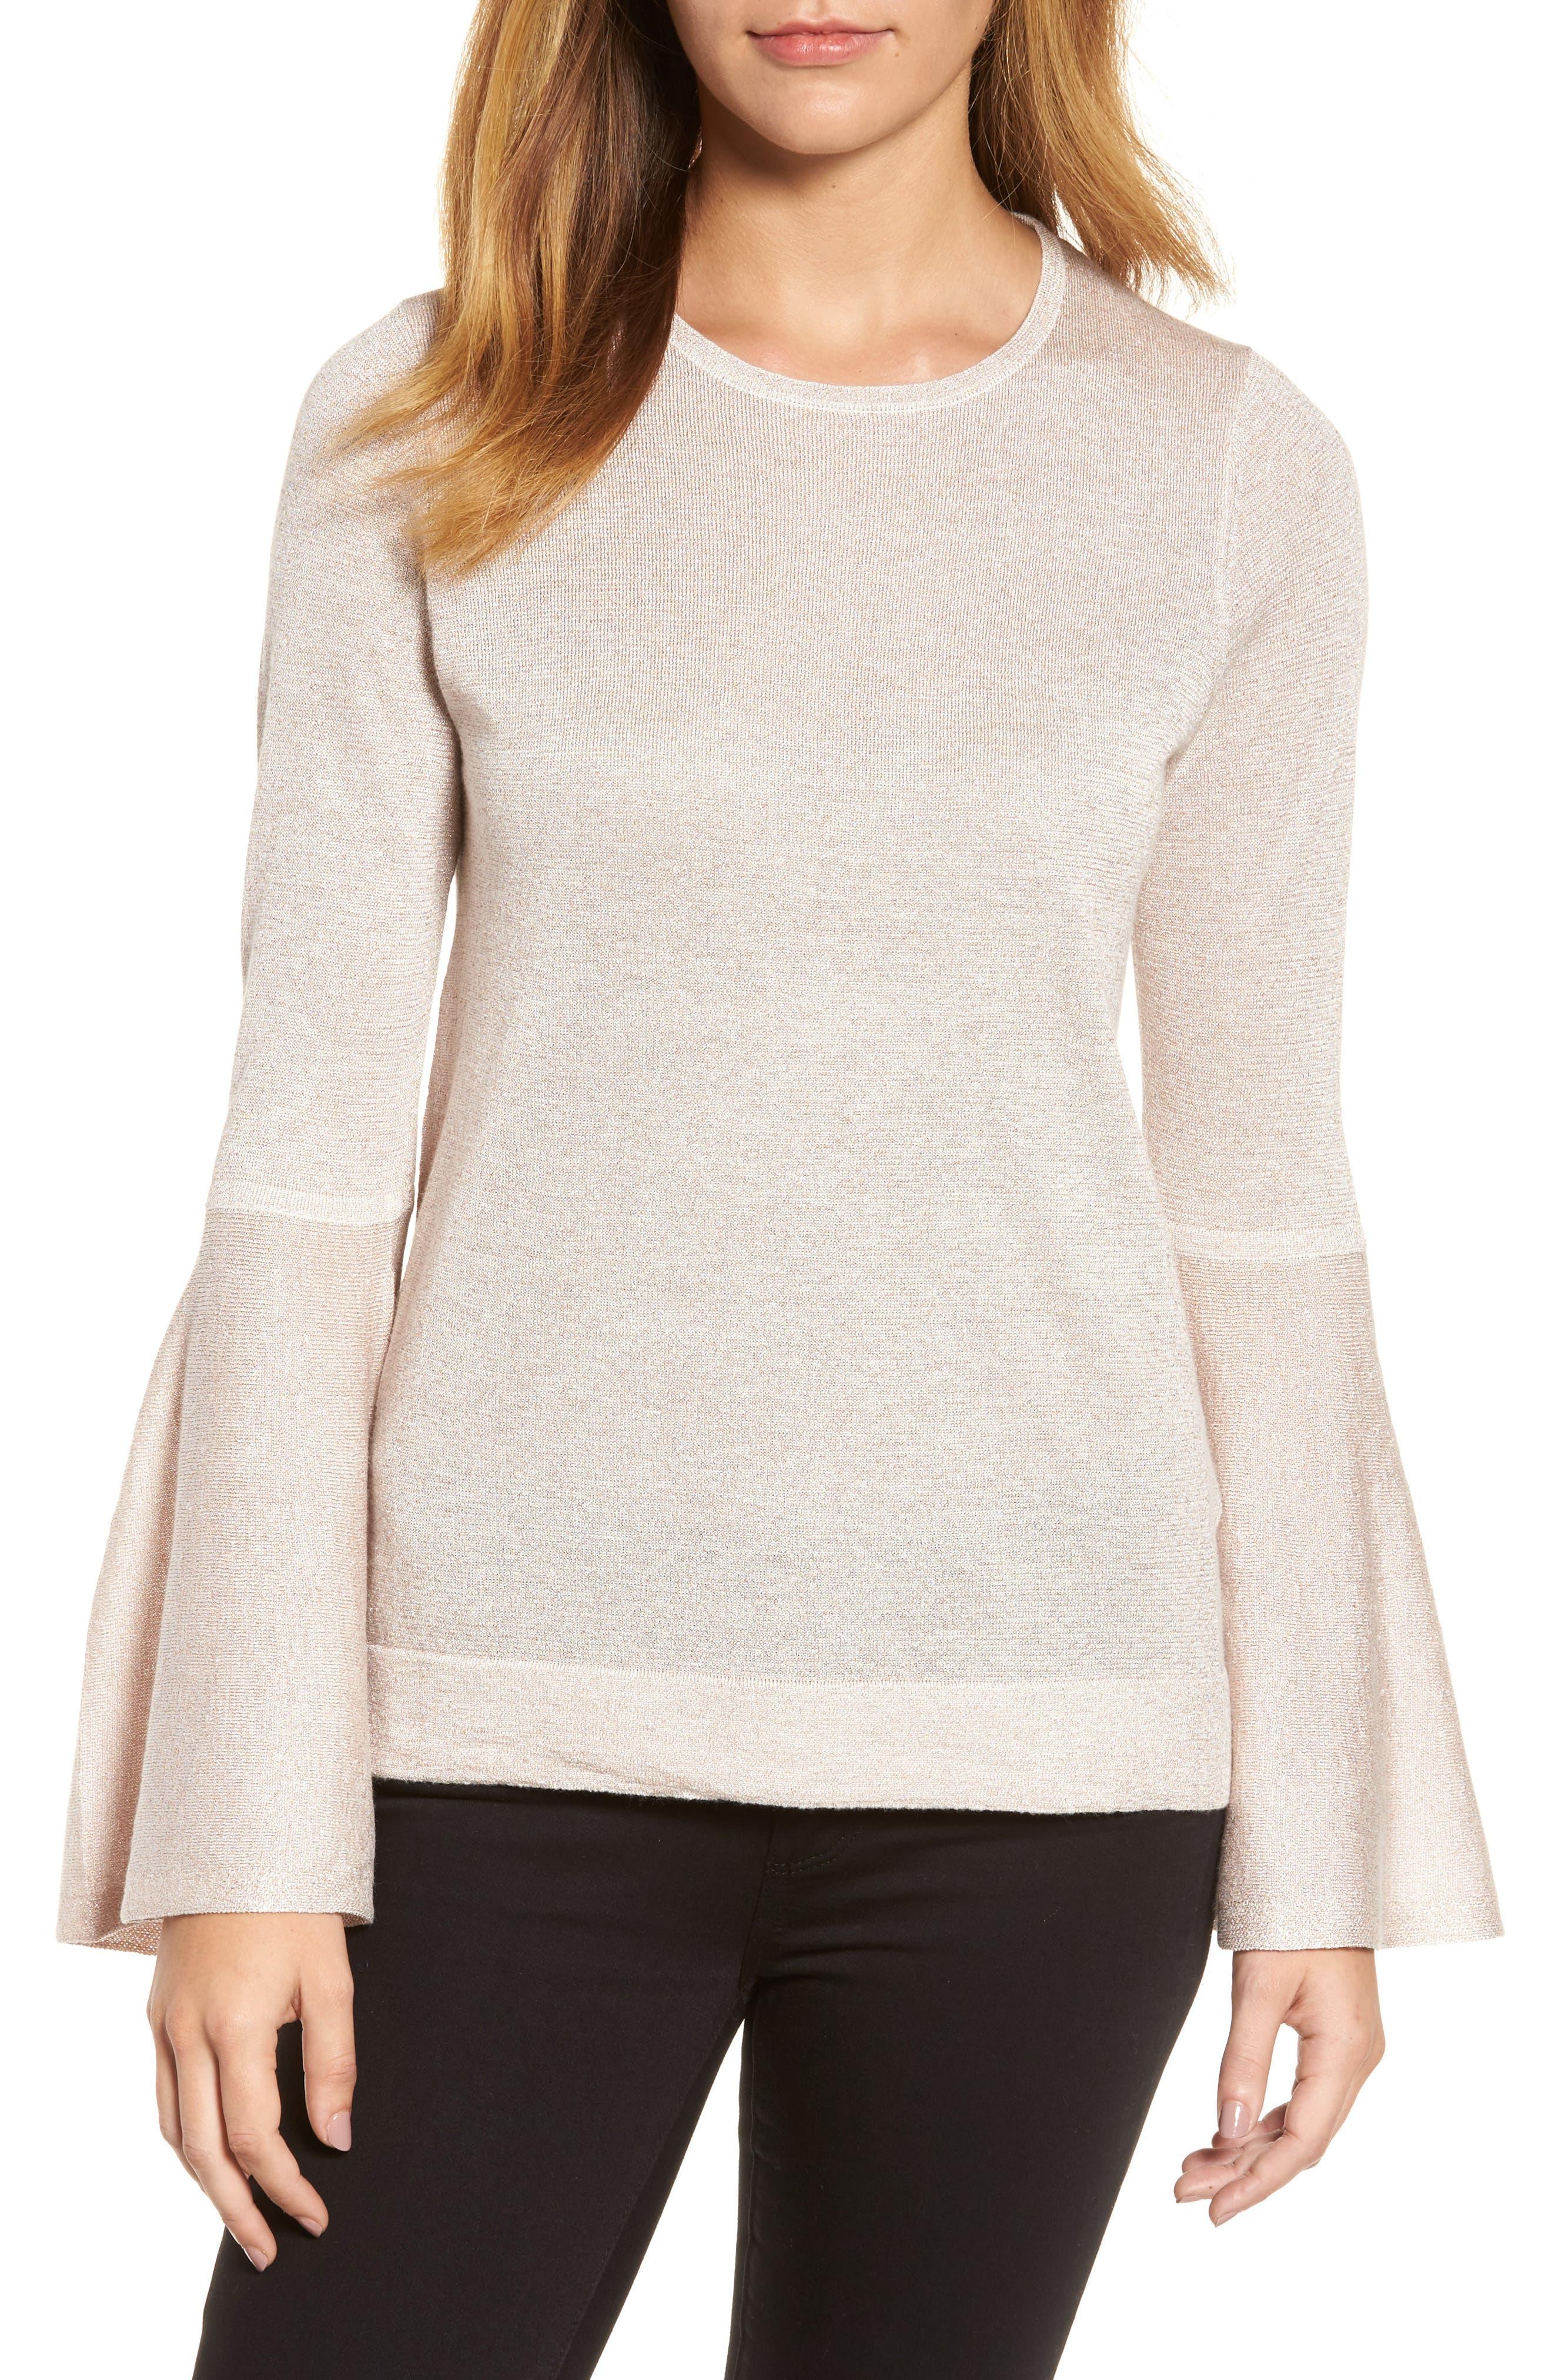 Vince Camuto Bell Sleeve Sweater (Regular & Petite)